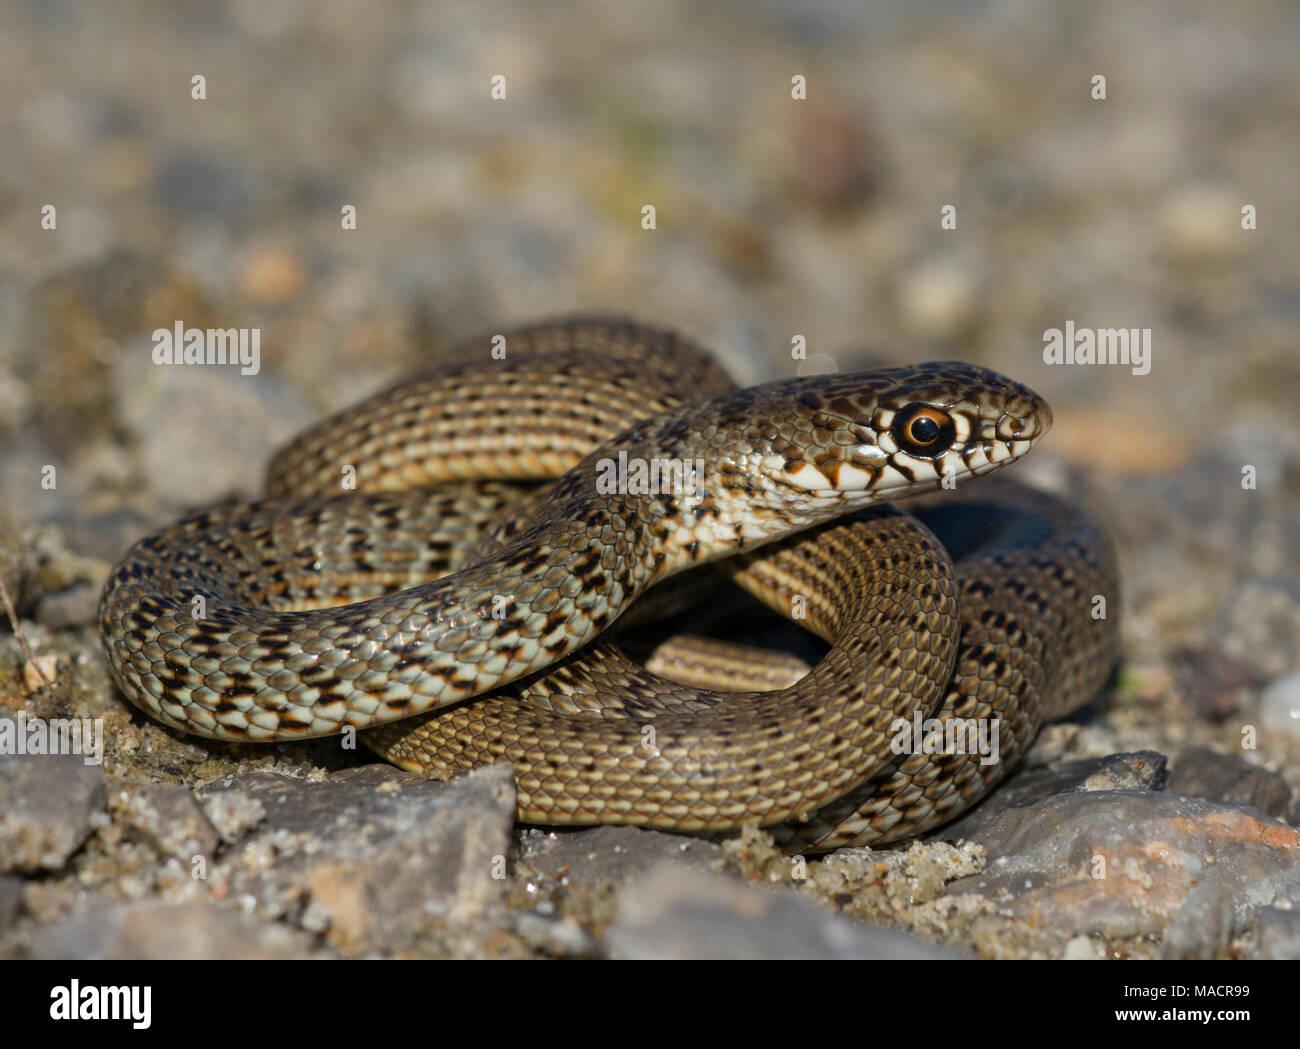 Species Of Greece Immagini e Fotos Stock Alamy